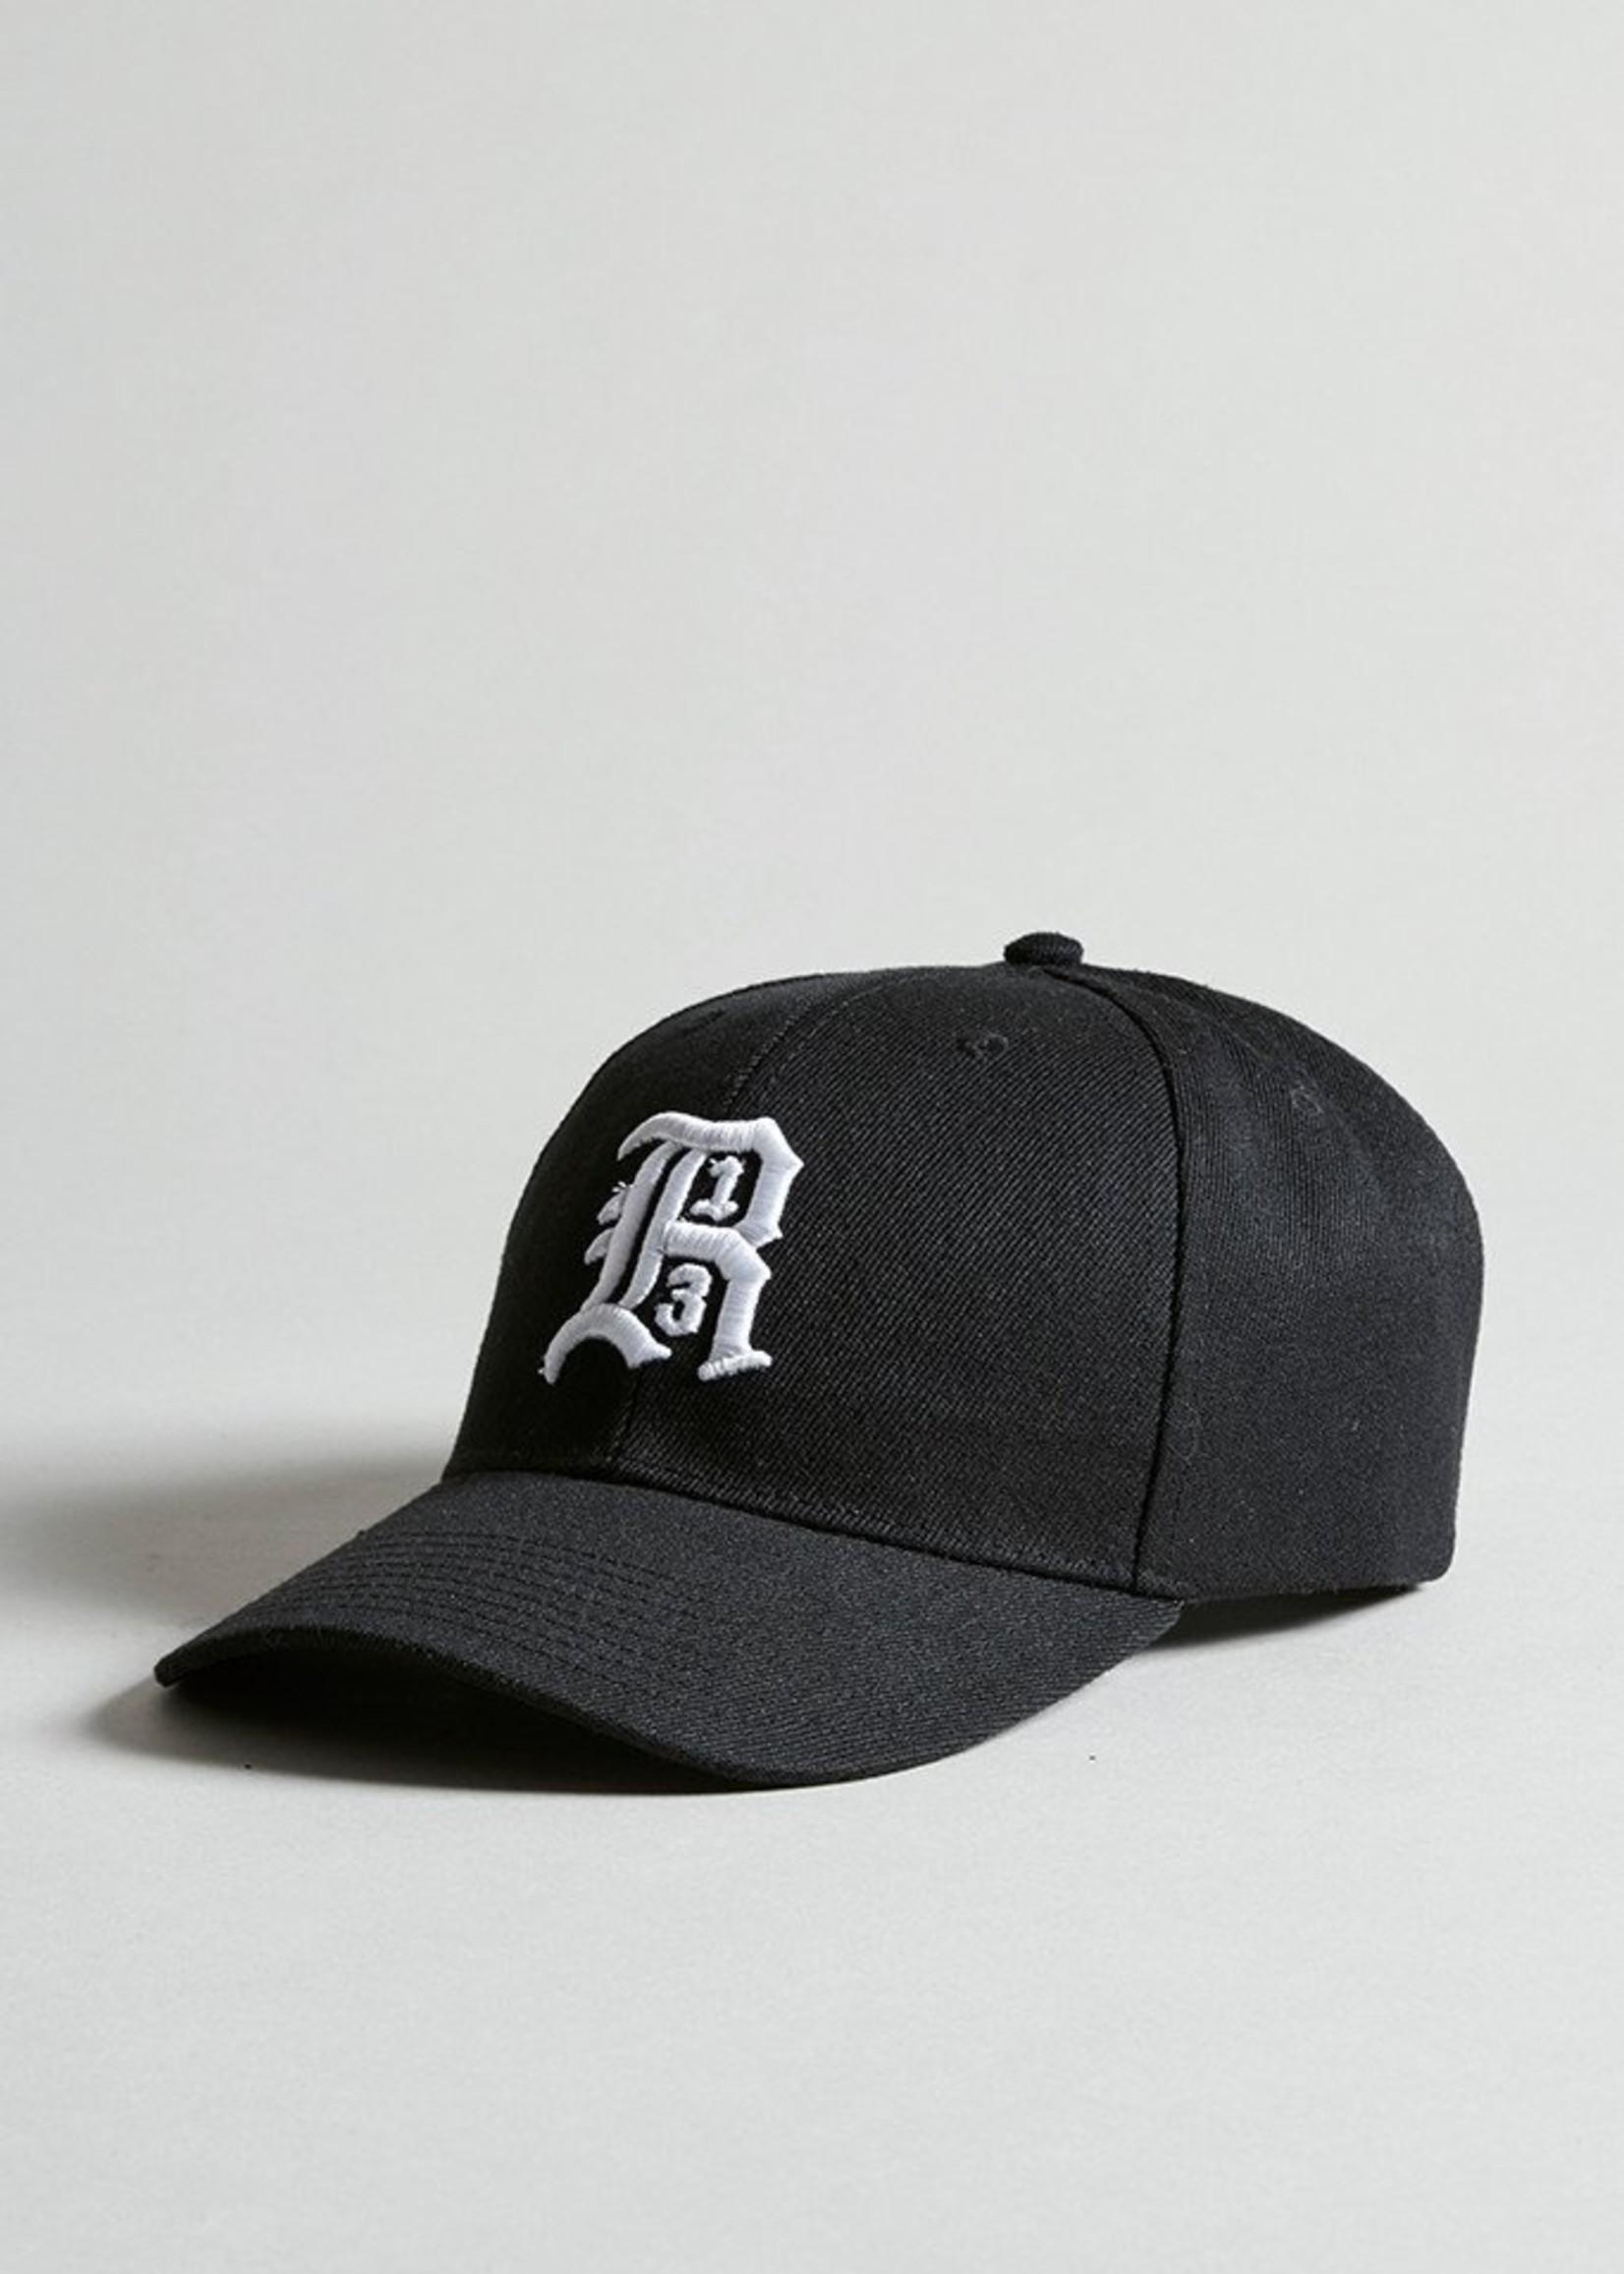 r13 r 13 hat black